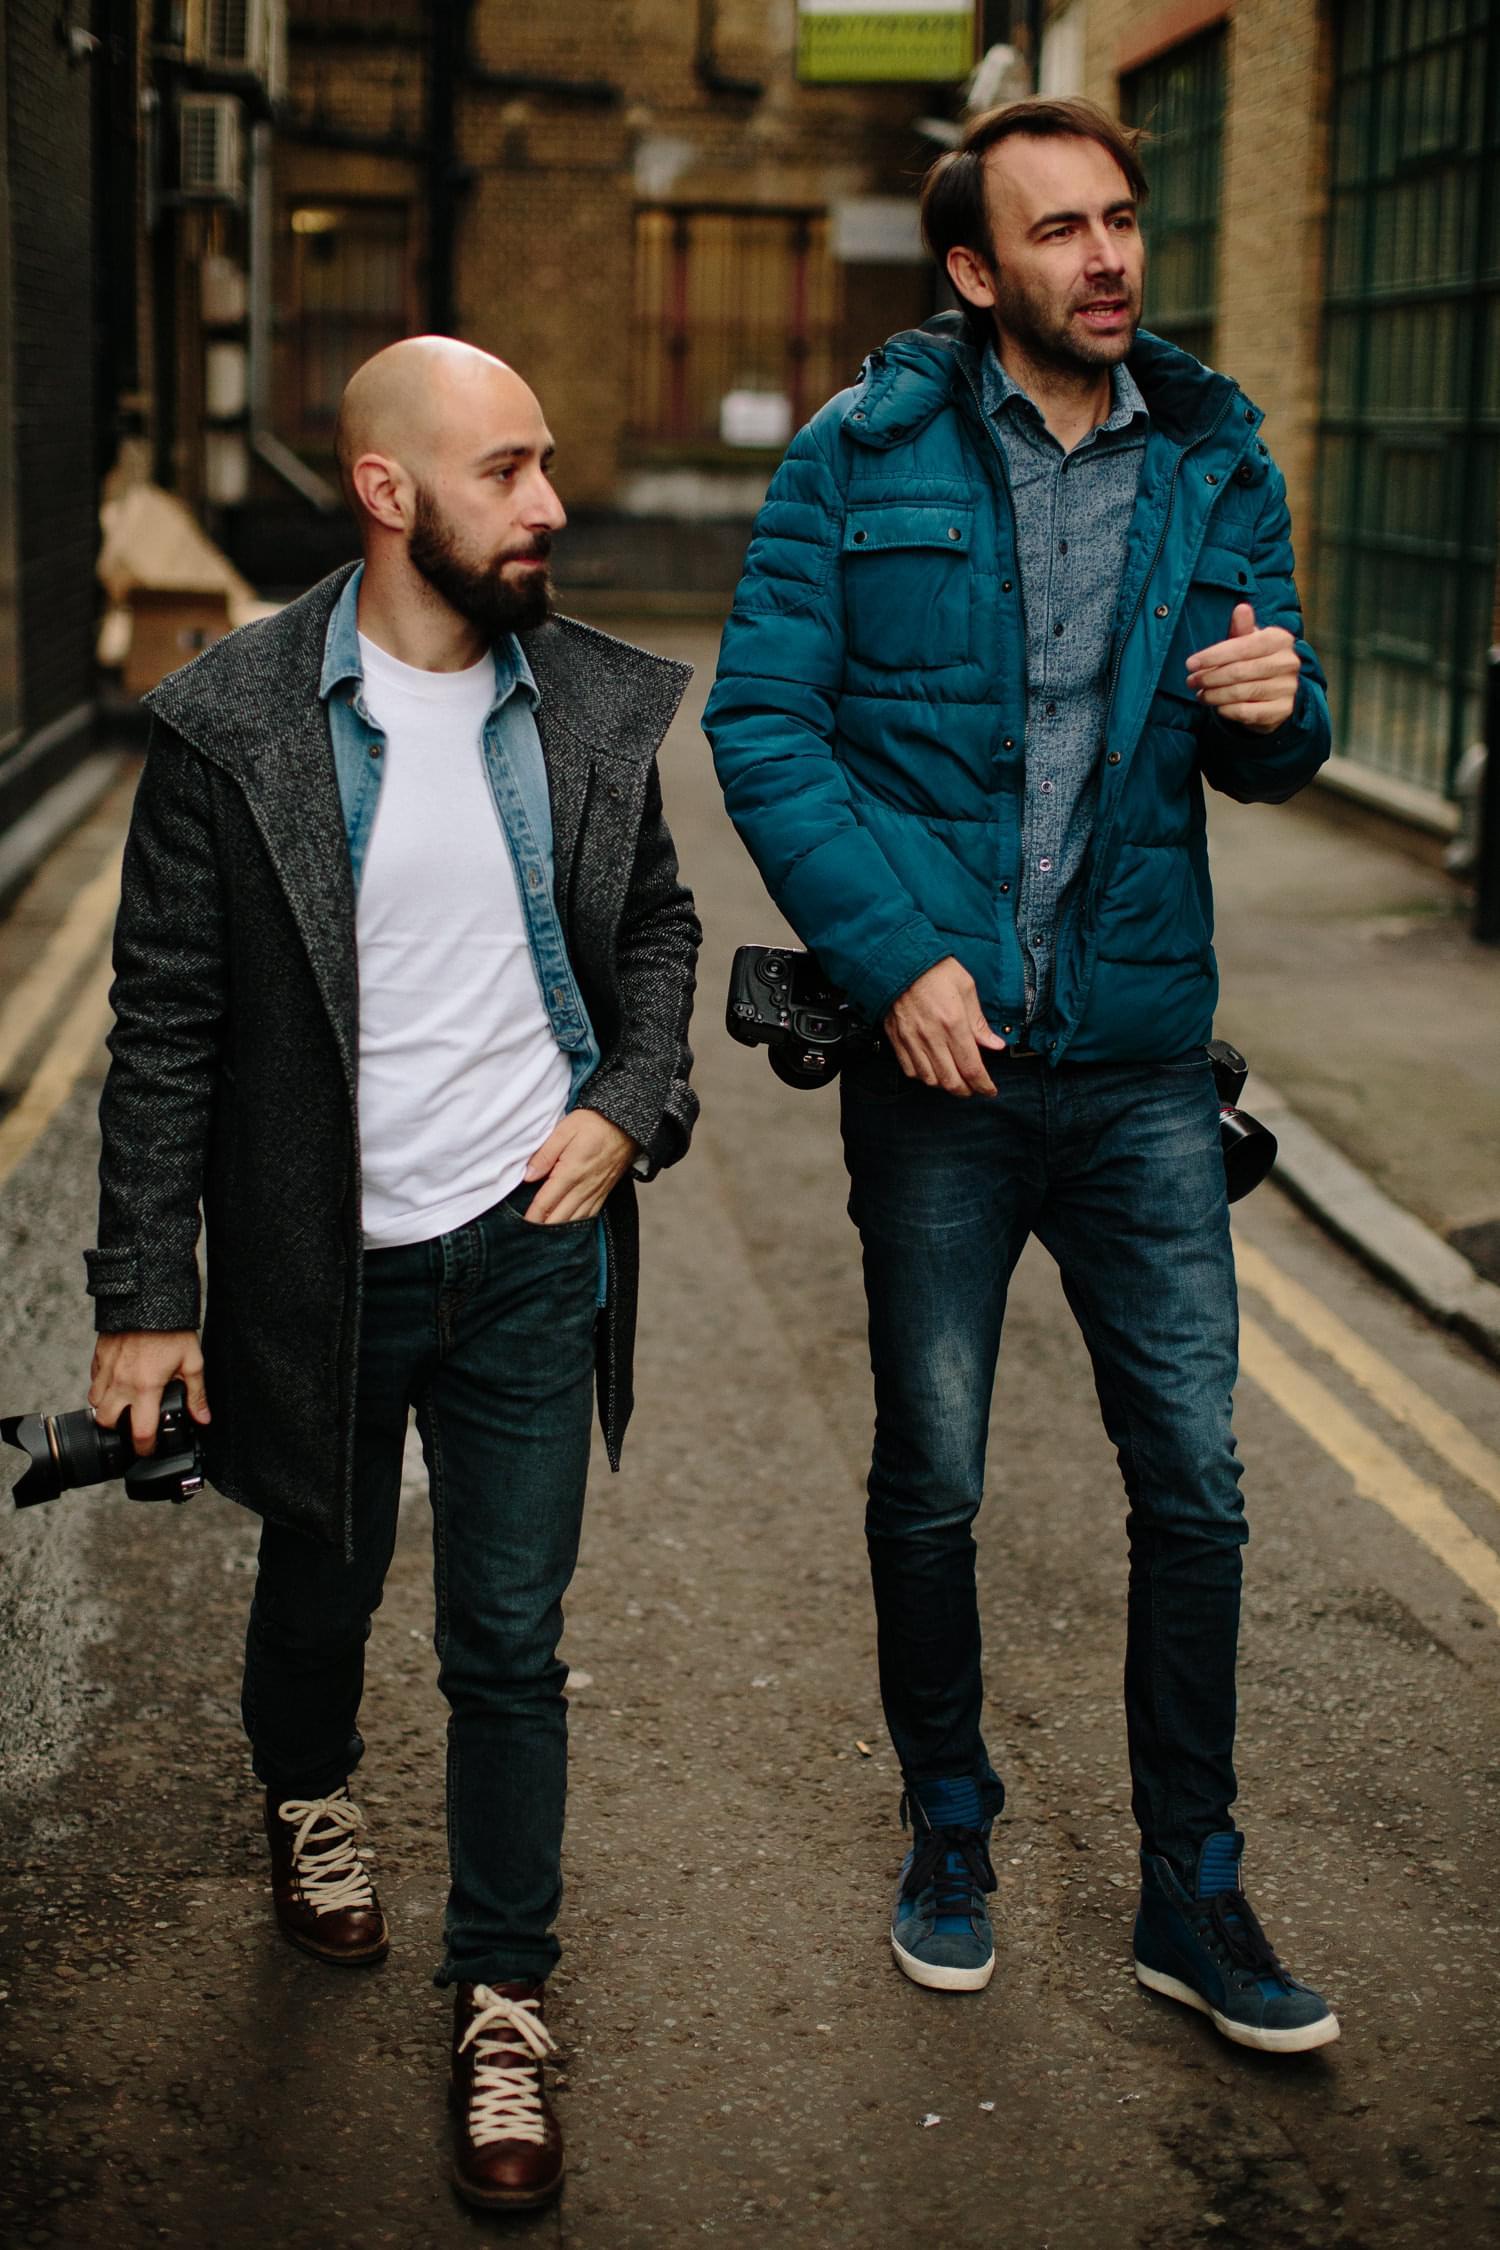 share-the-journey-london-wedding-photography-workshop-37